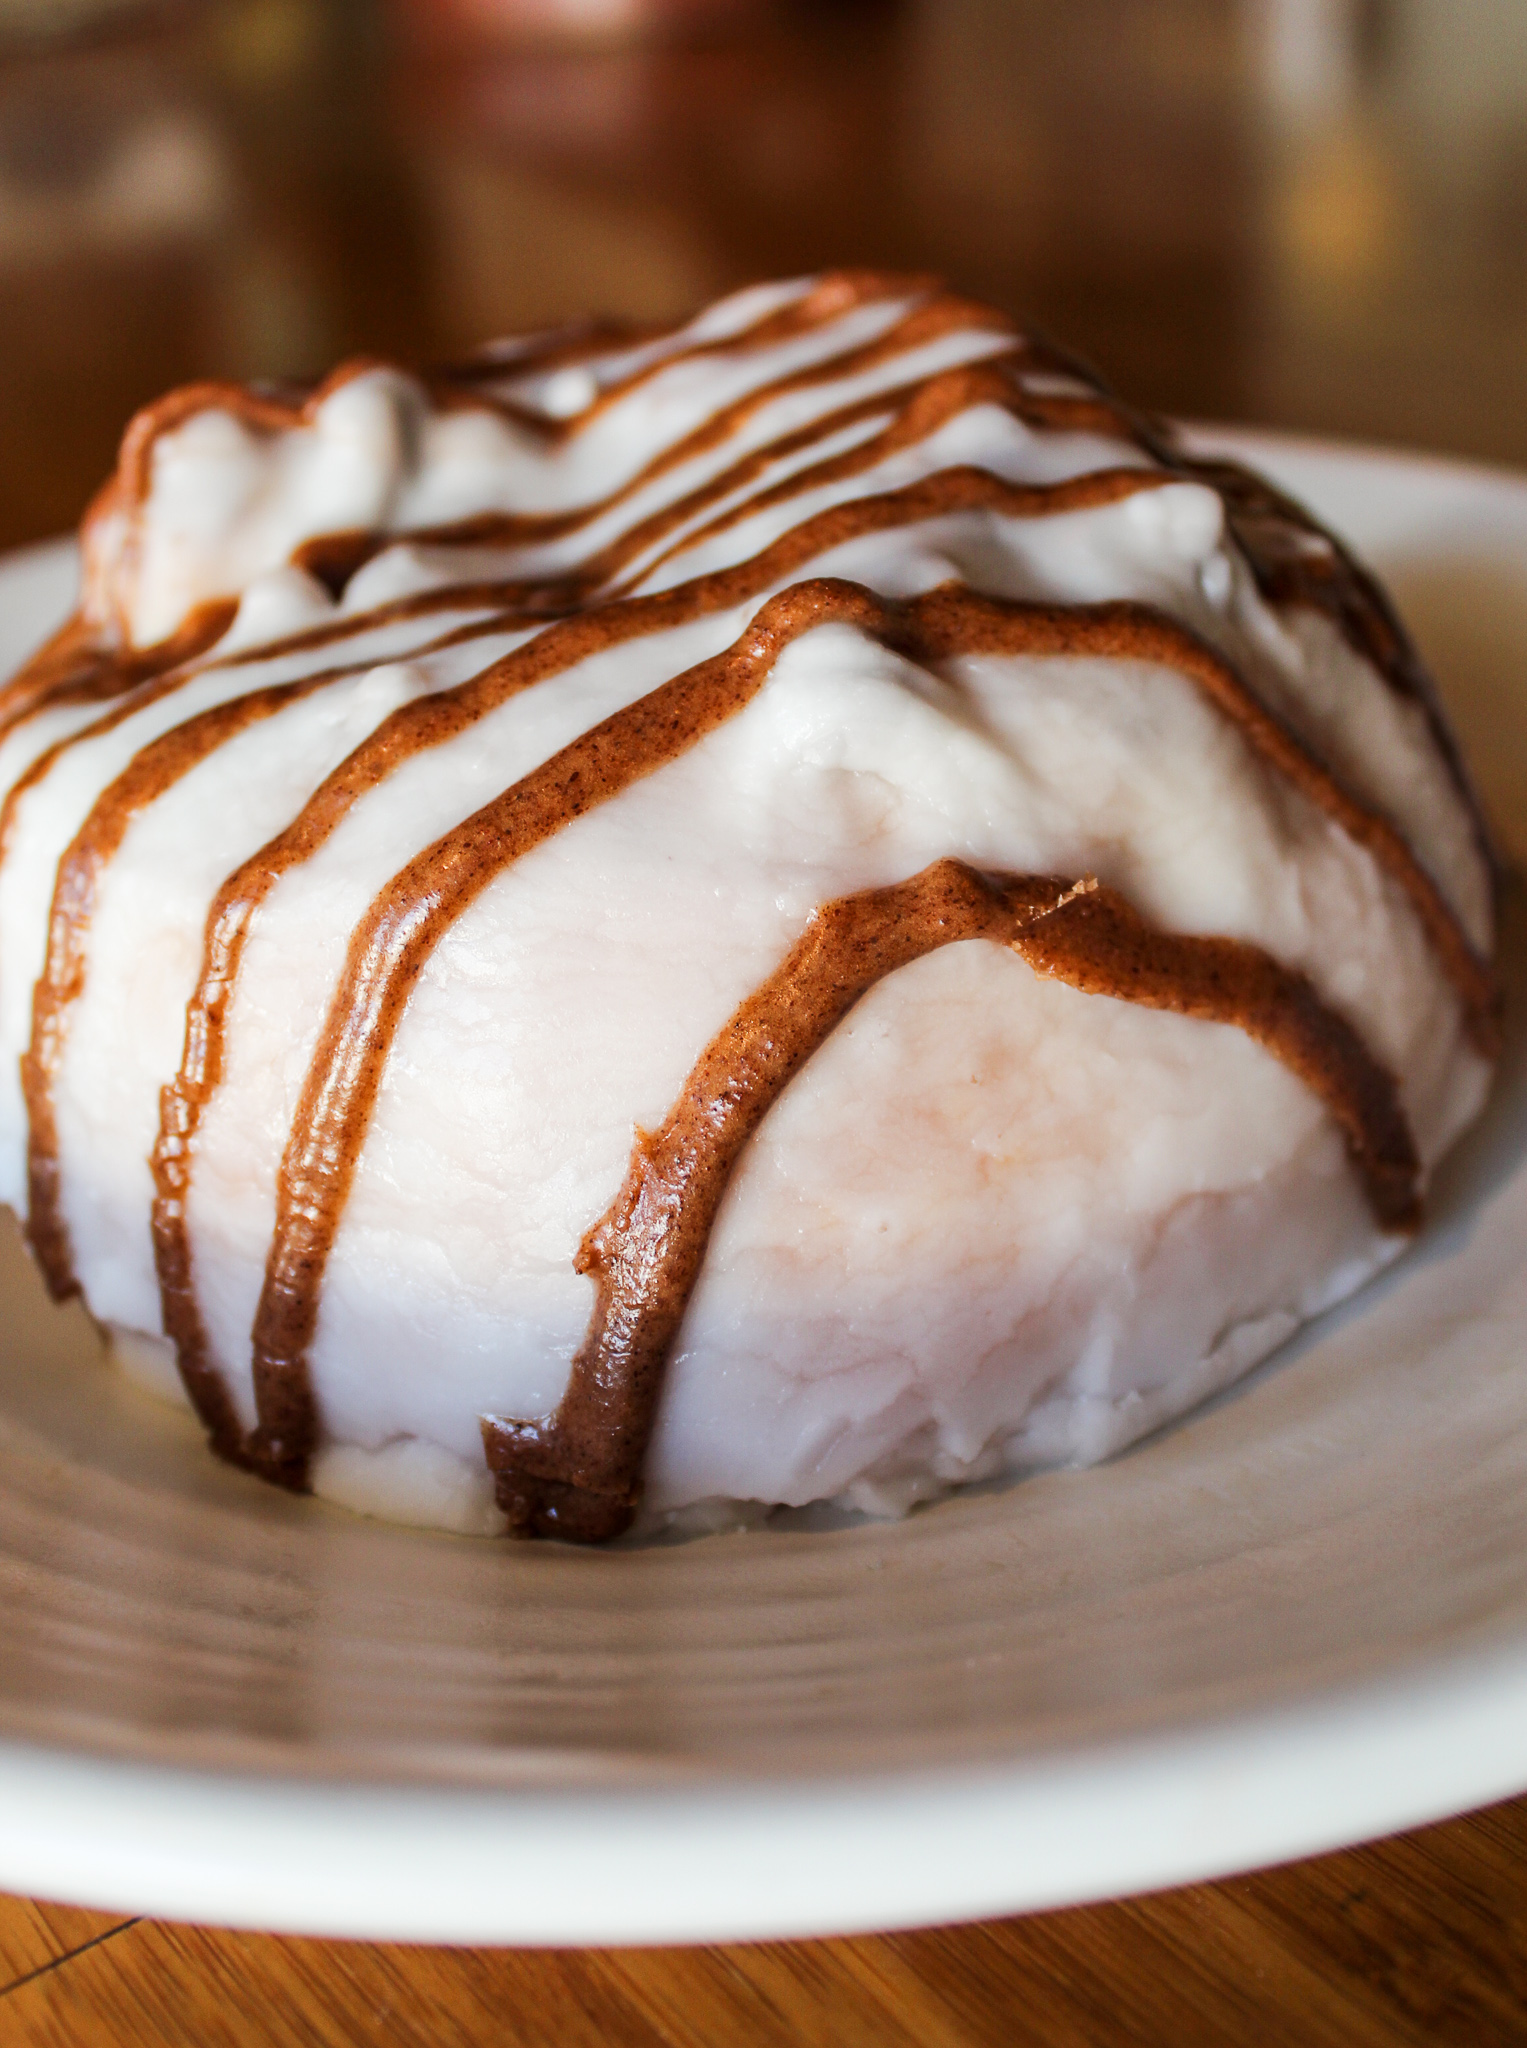 Cinnamon Roll w/ pecans